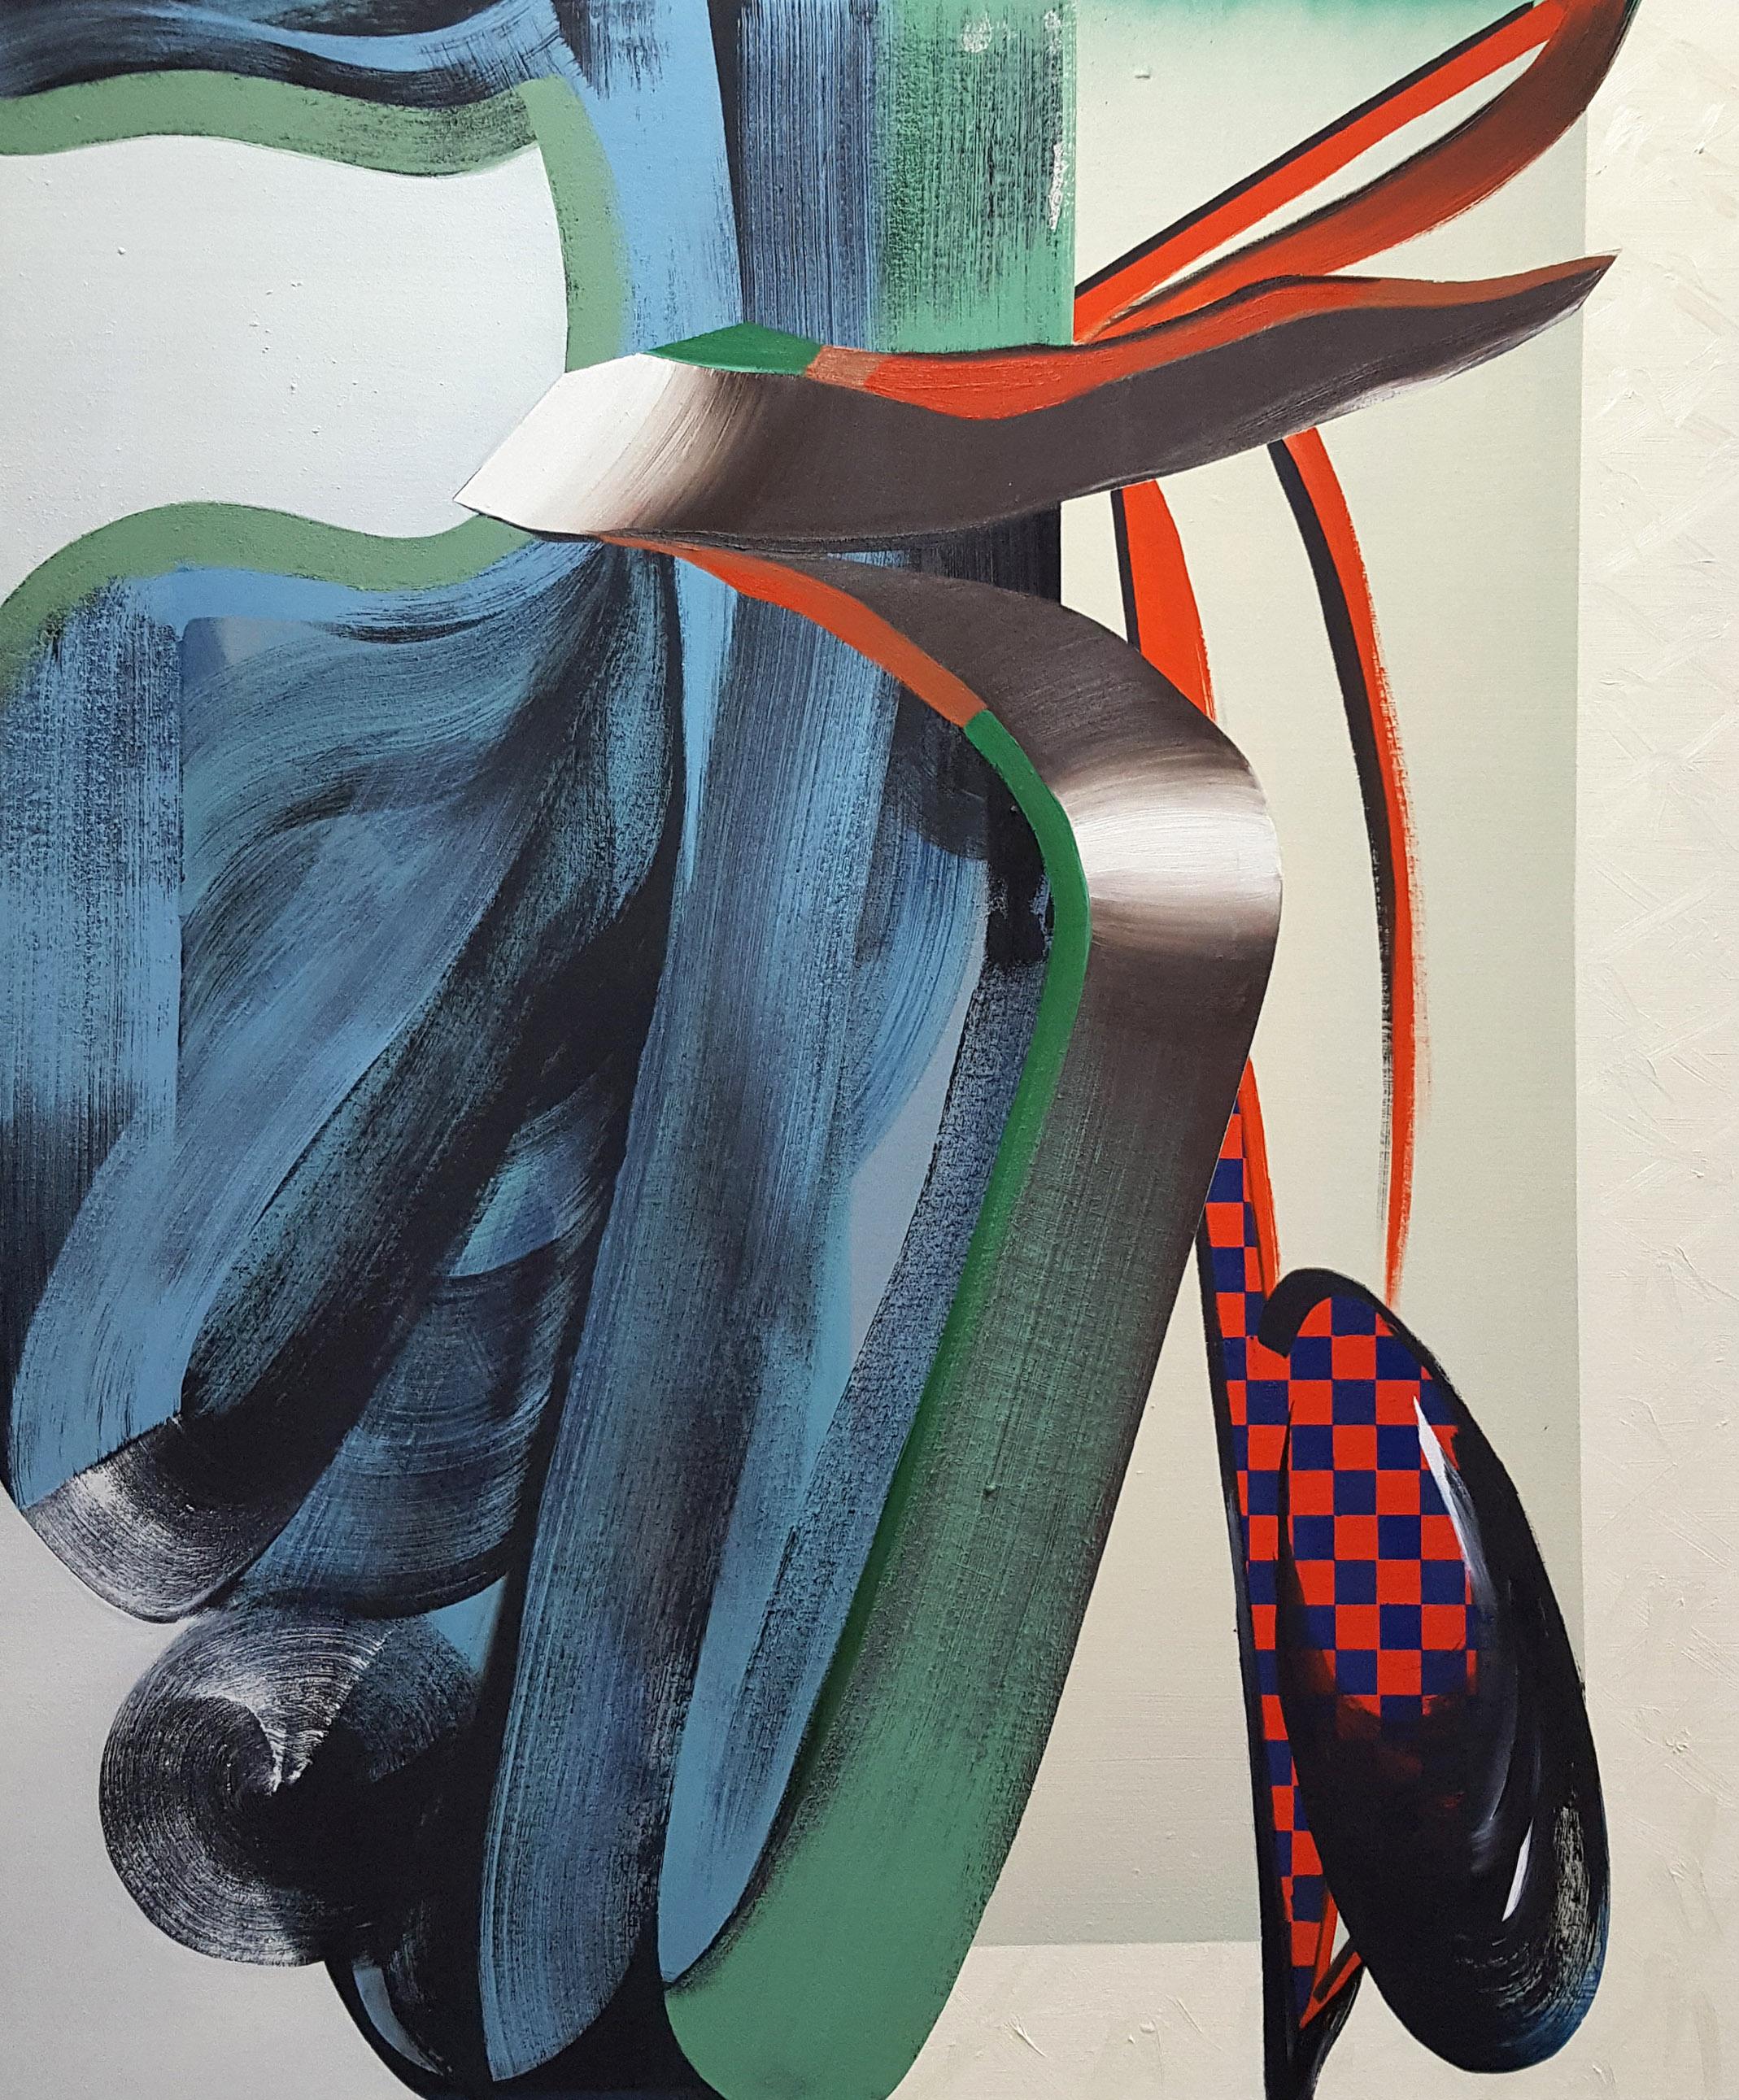 Janine van Oene / Mussel Smells / 2018 / 120 x 100 cm /  oil on canvas